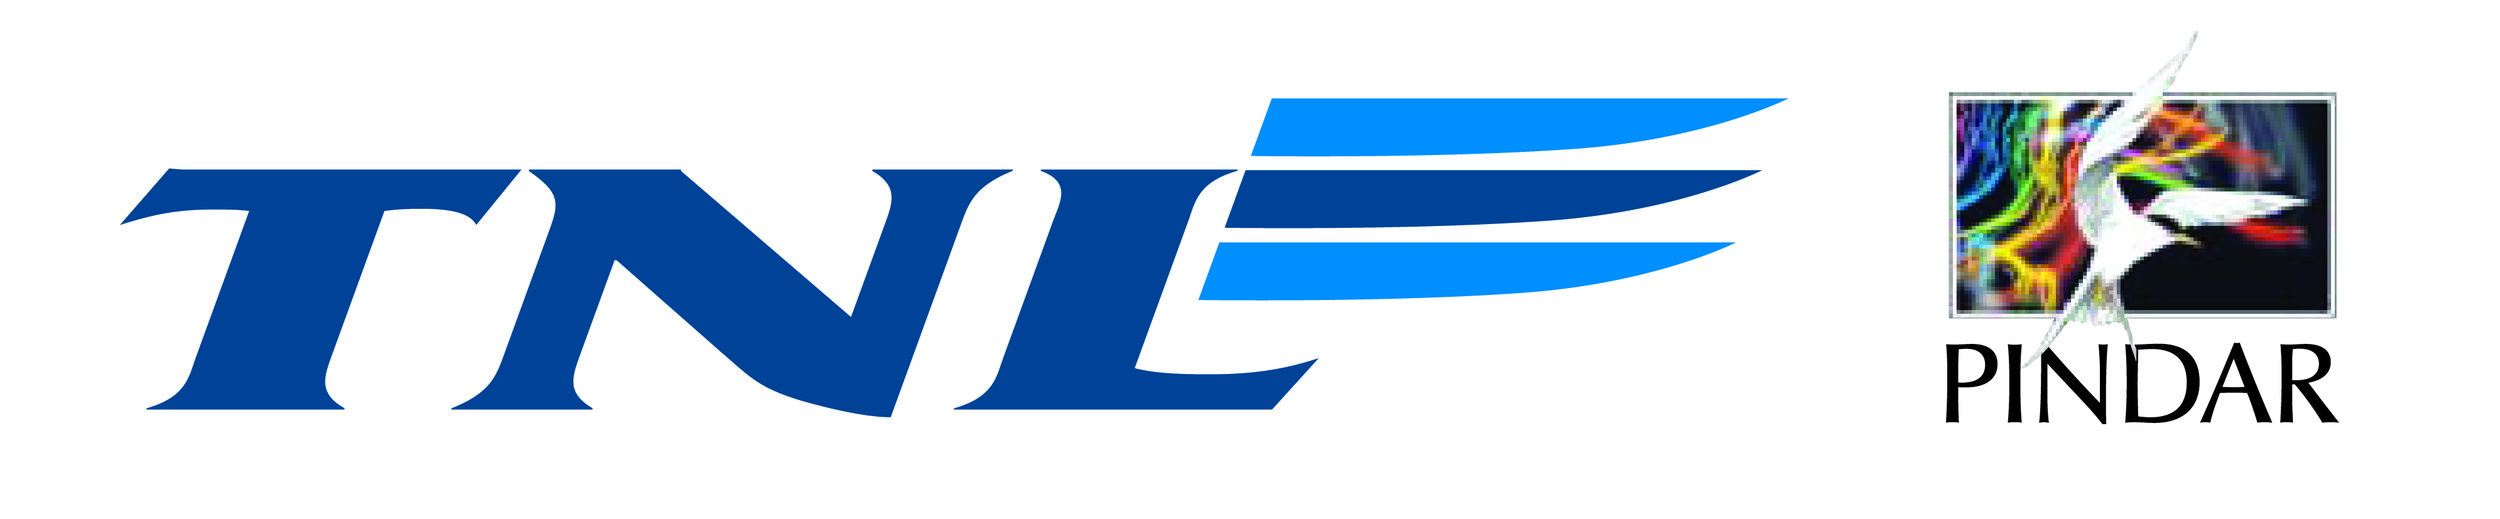 180411 TNL_Pindar_logo-0717.jpg